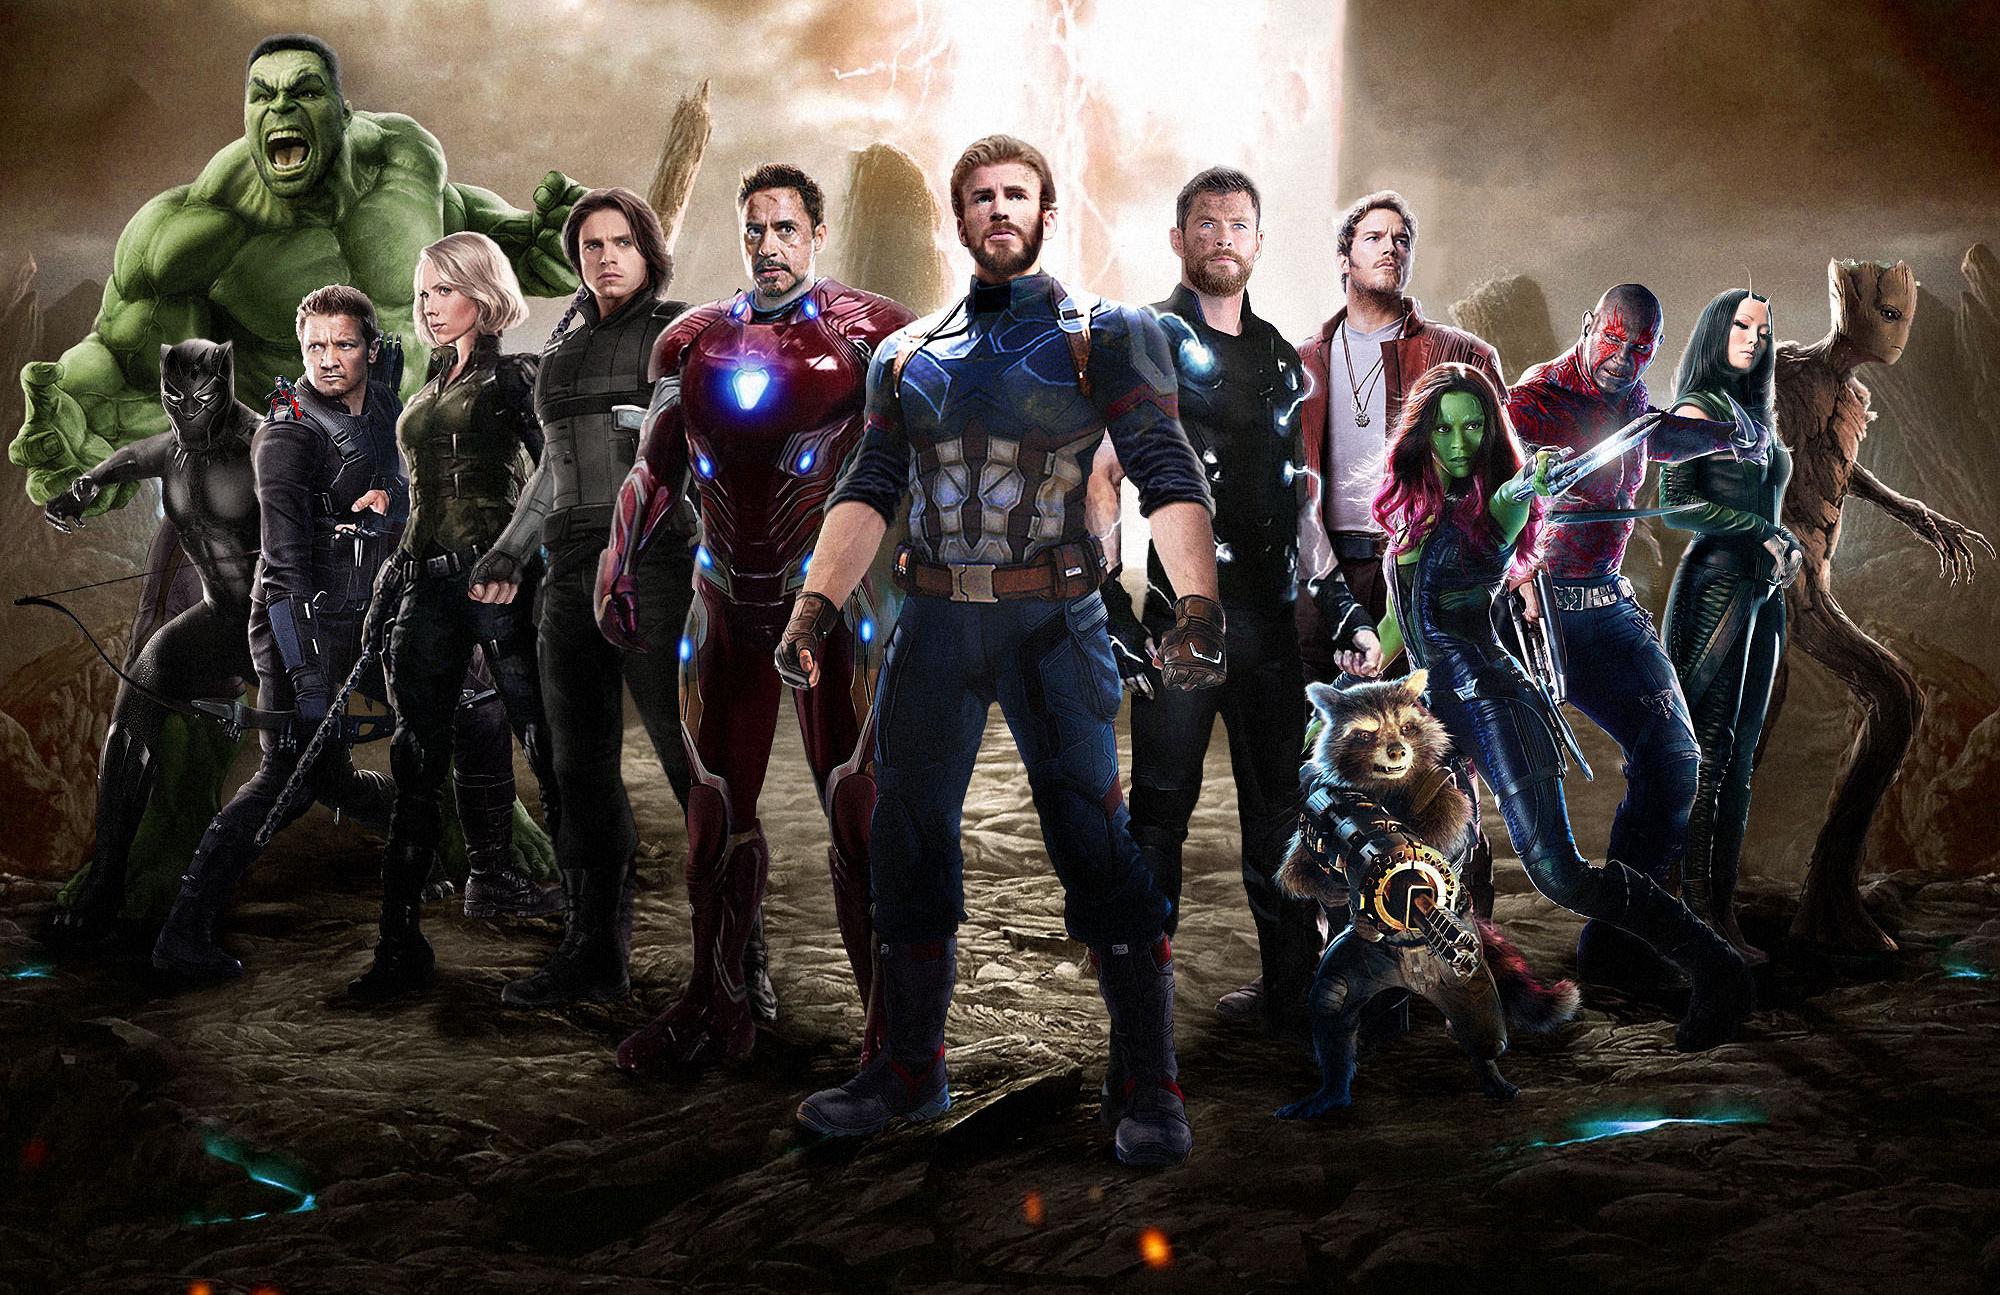 Cute Animal Iphone Wallpaper Avengers Infinity War 2018 Movie Fan Art Wallpapers High